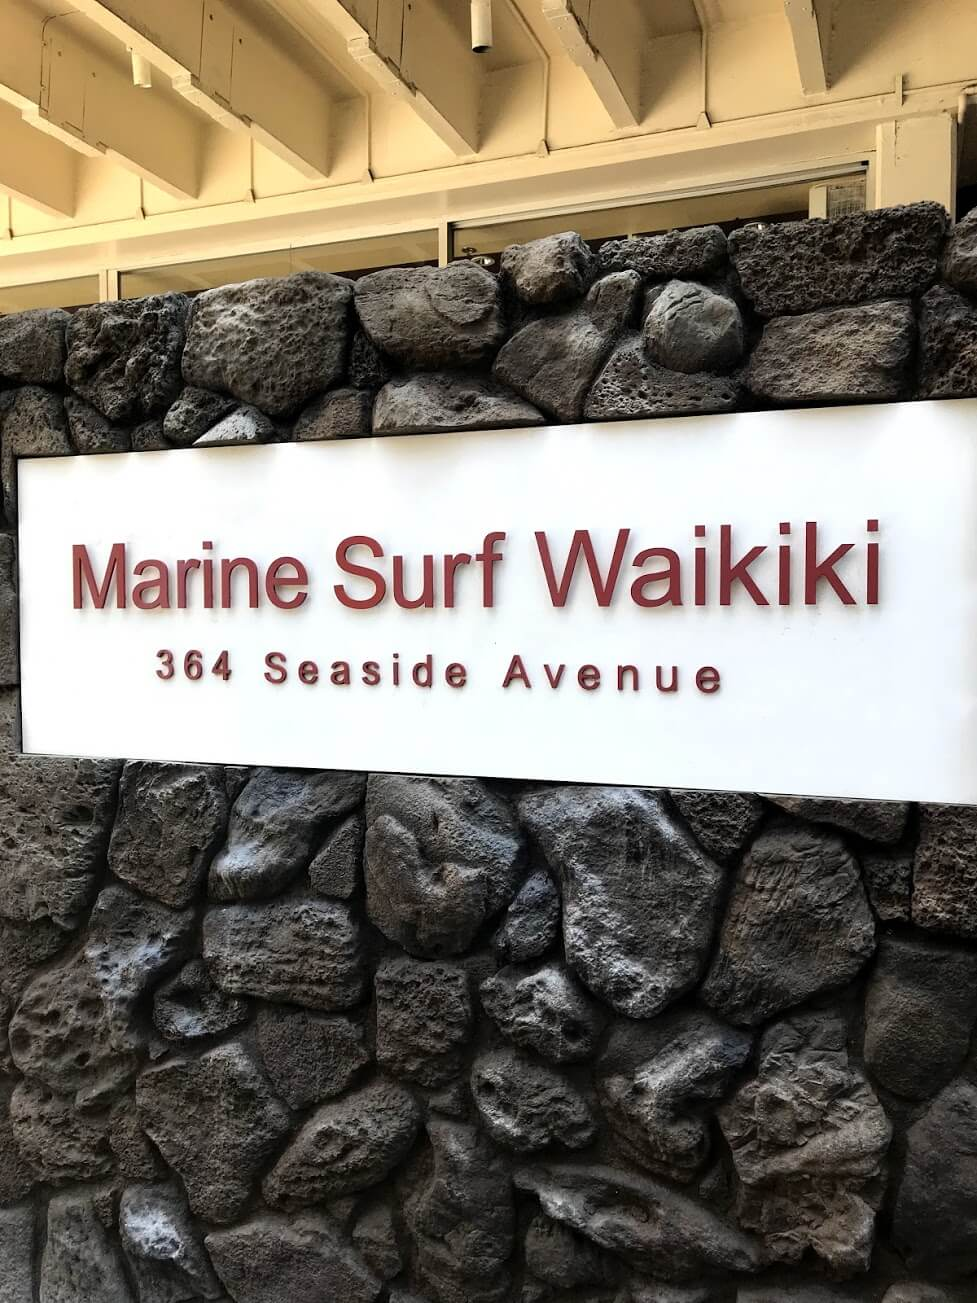 Marine Surf Waikikiの看板